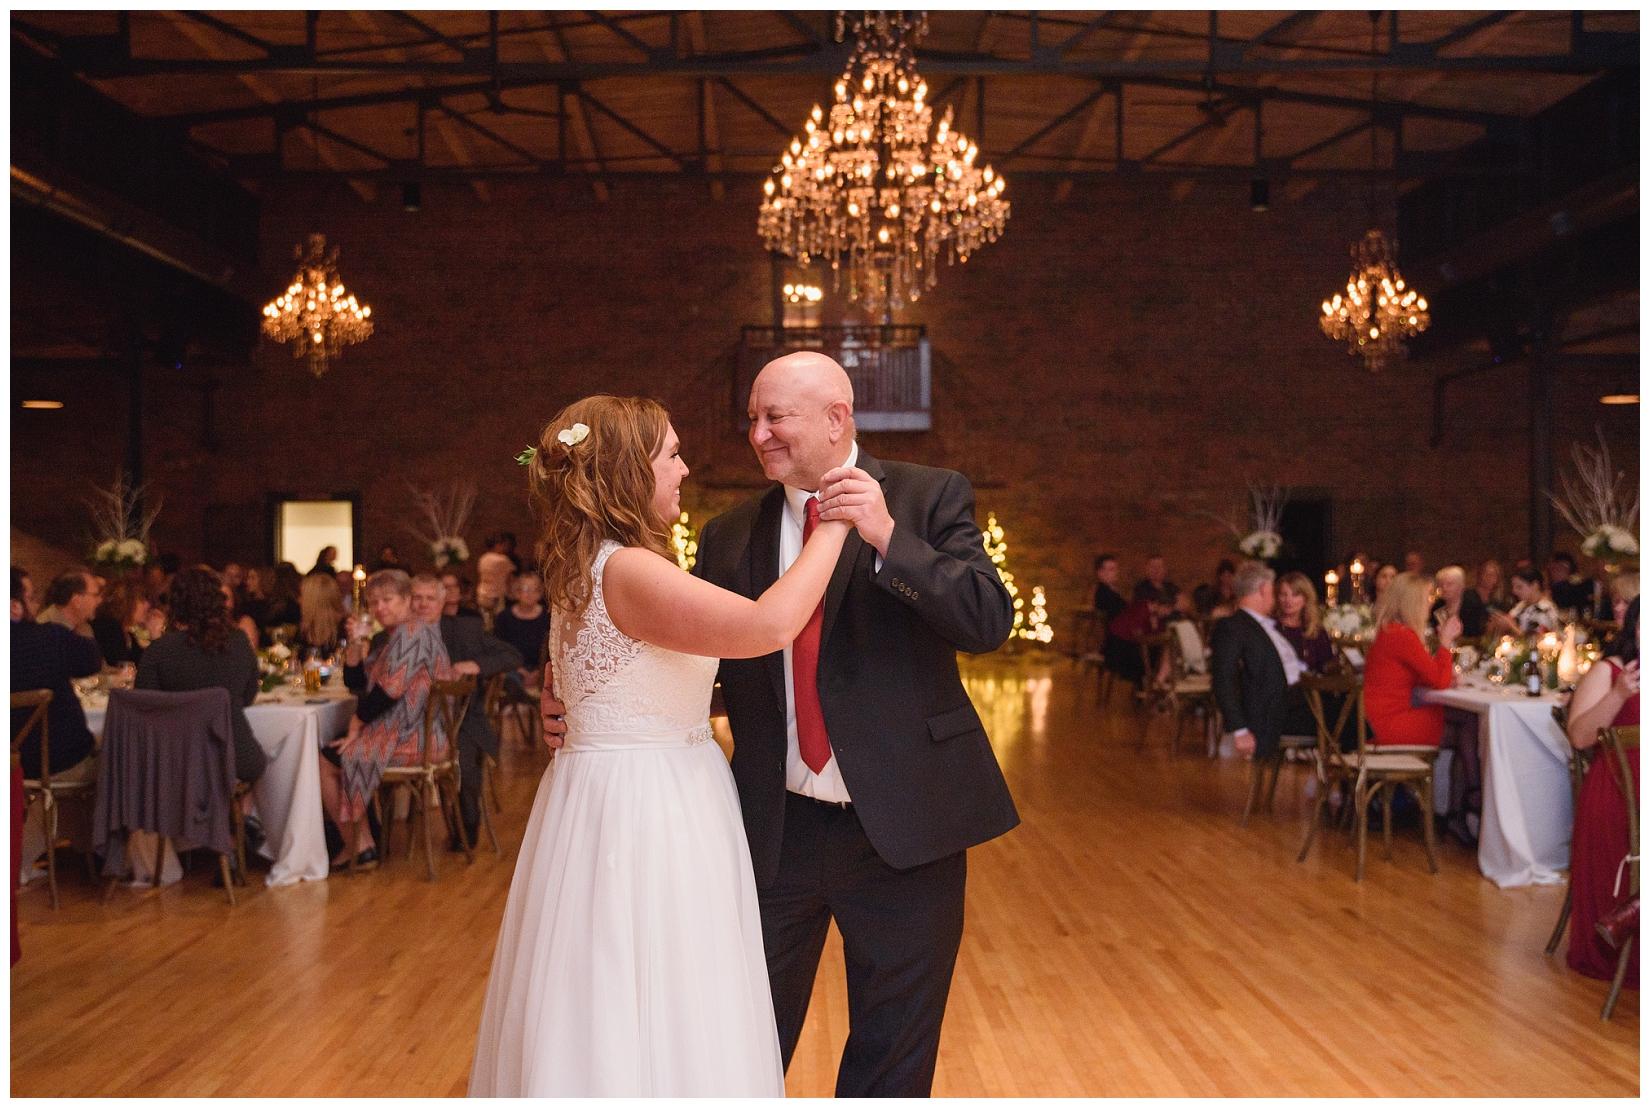 cat-alkire-wedding-photographer-indiana-chicago-indianapolis-fort-wayne_1004.jpg